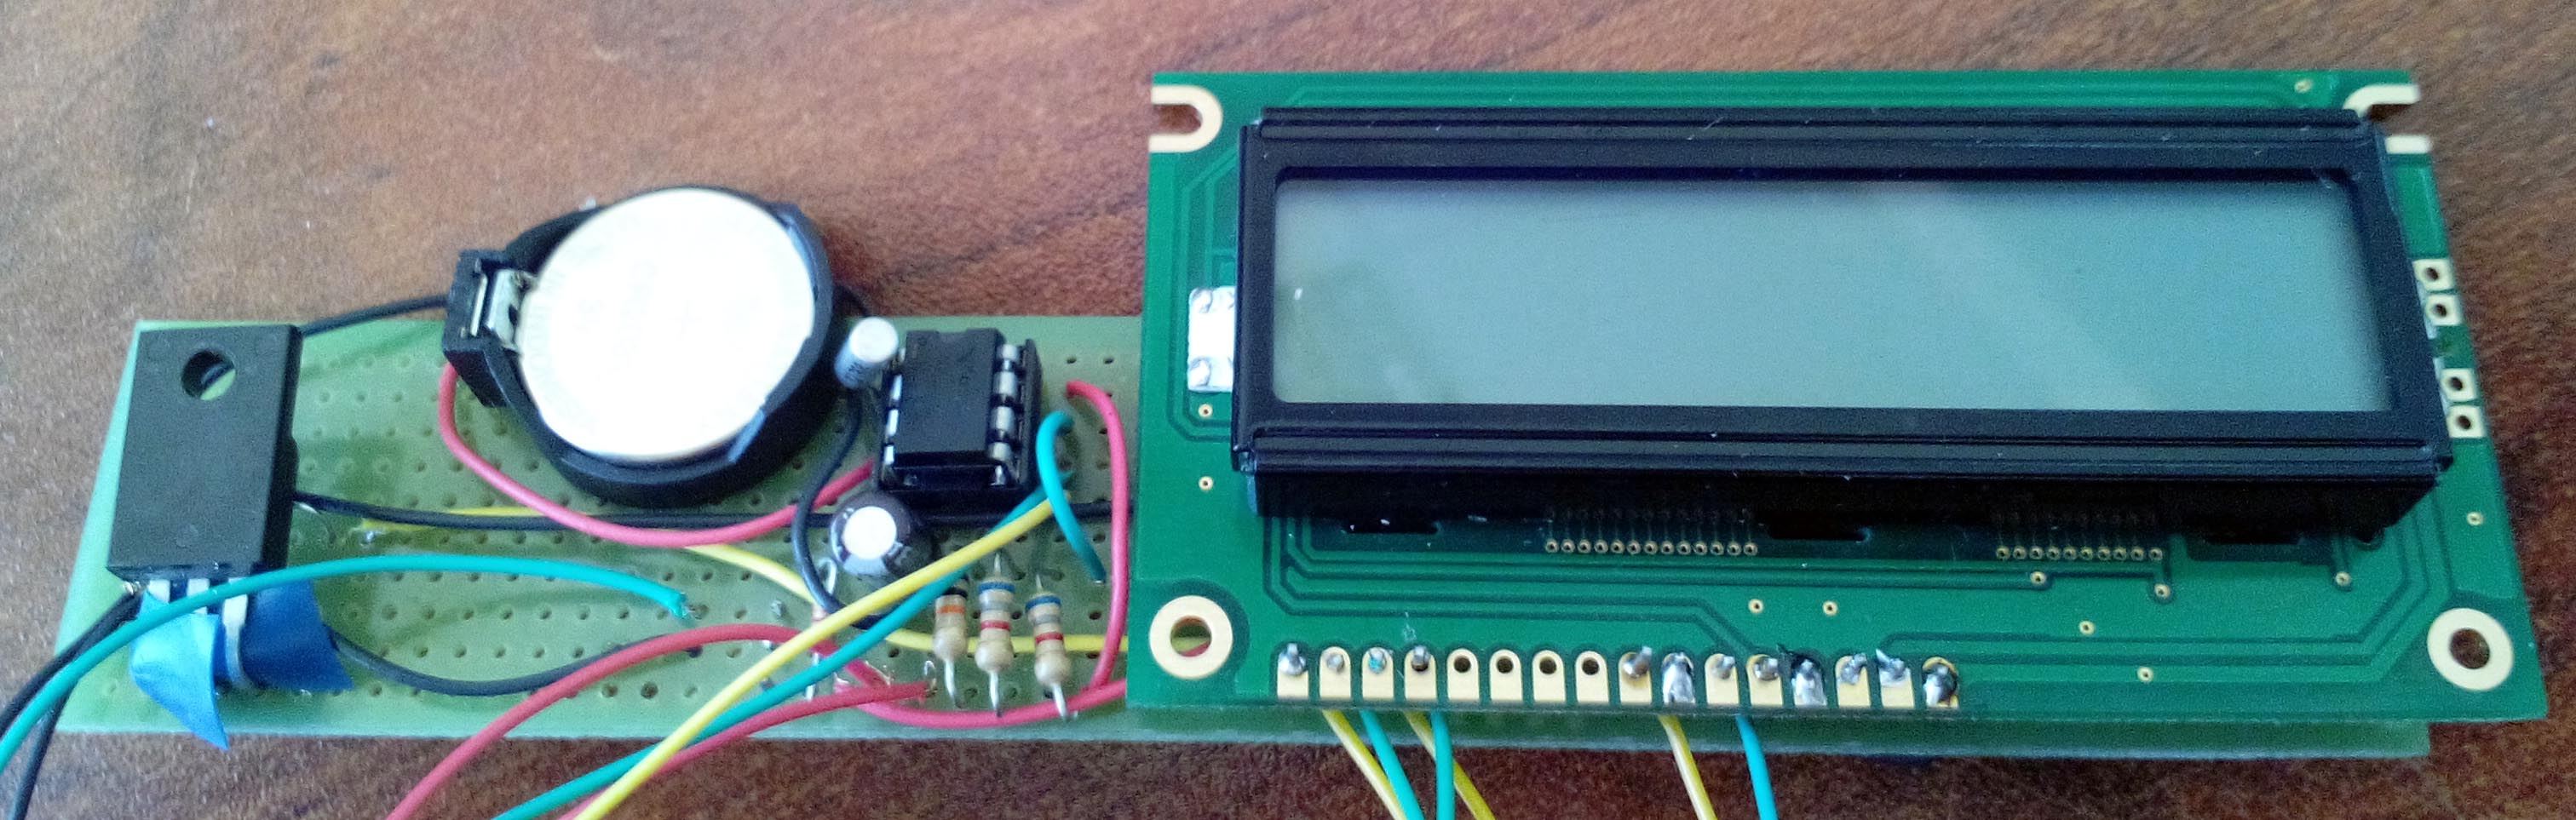 Arduino display